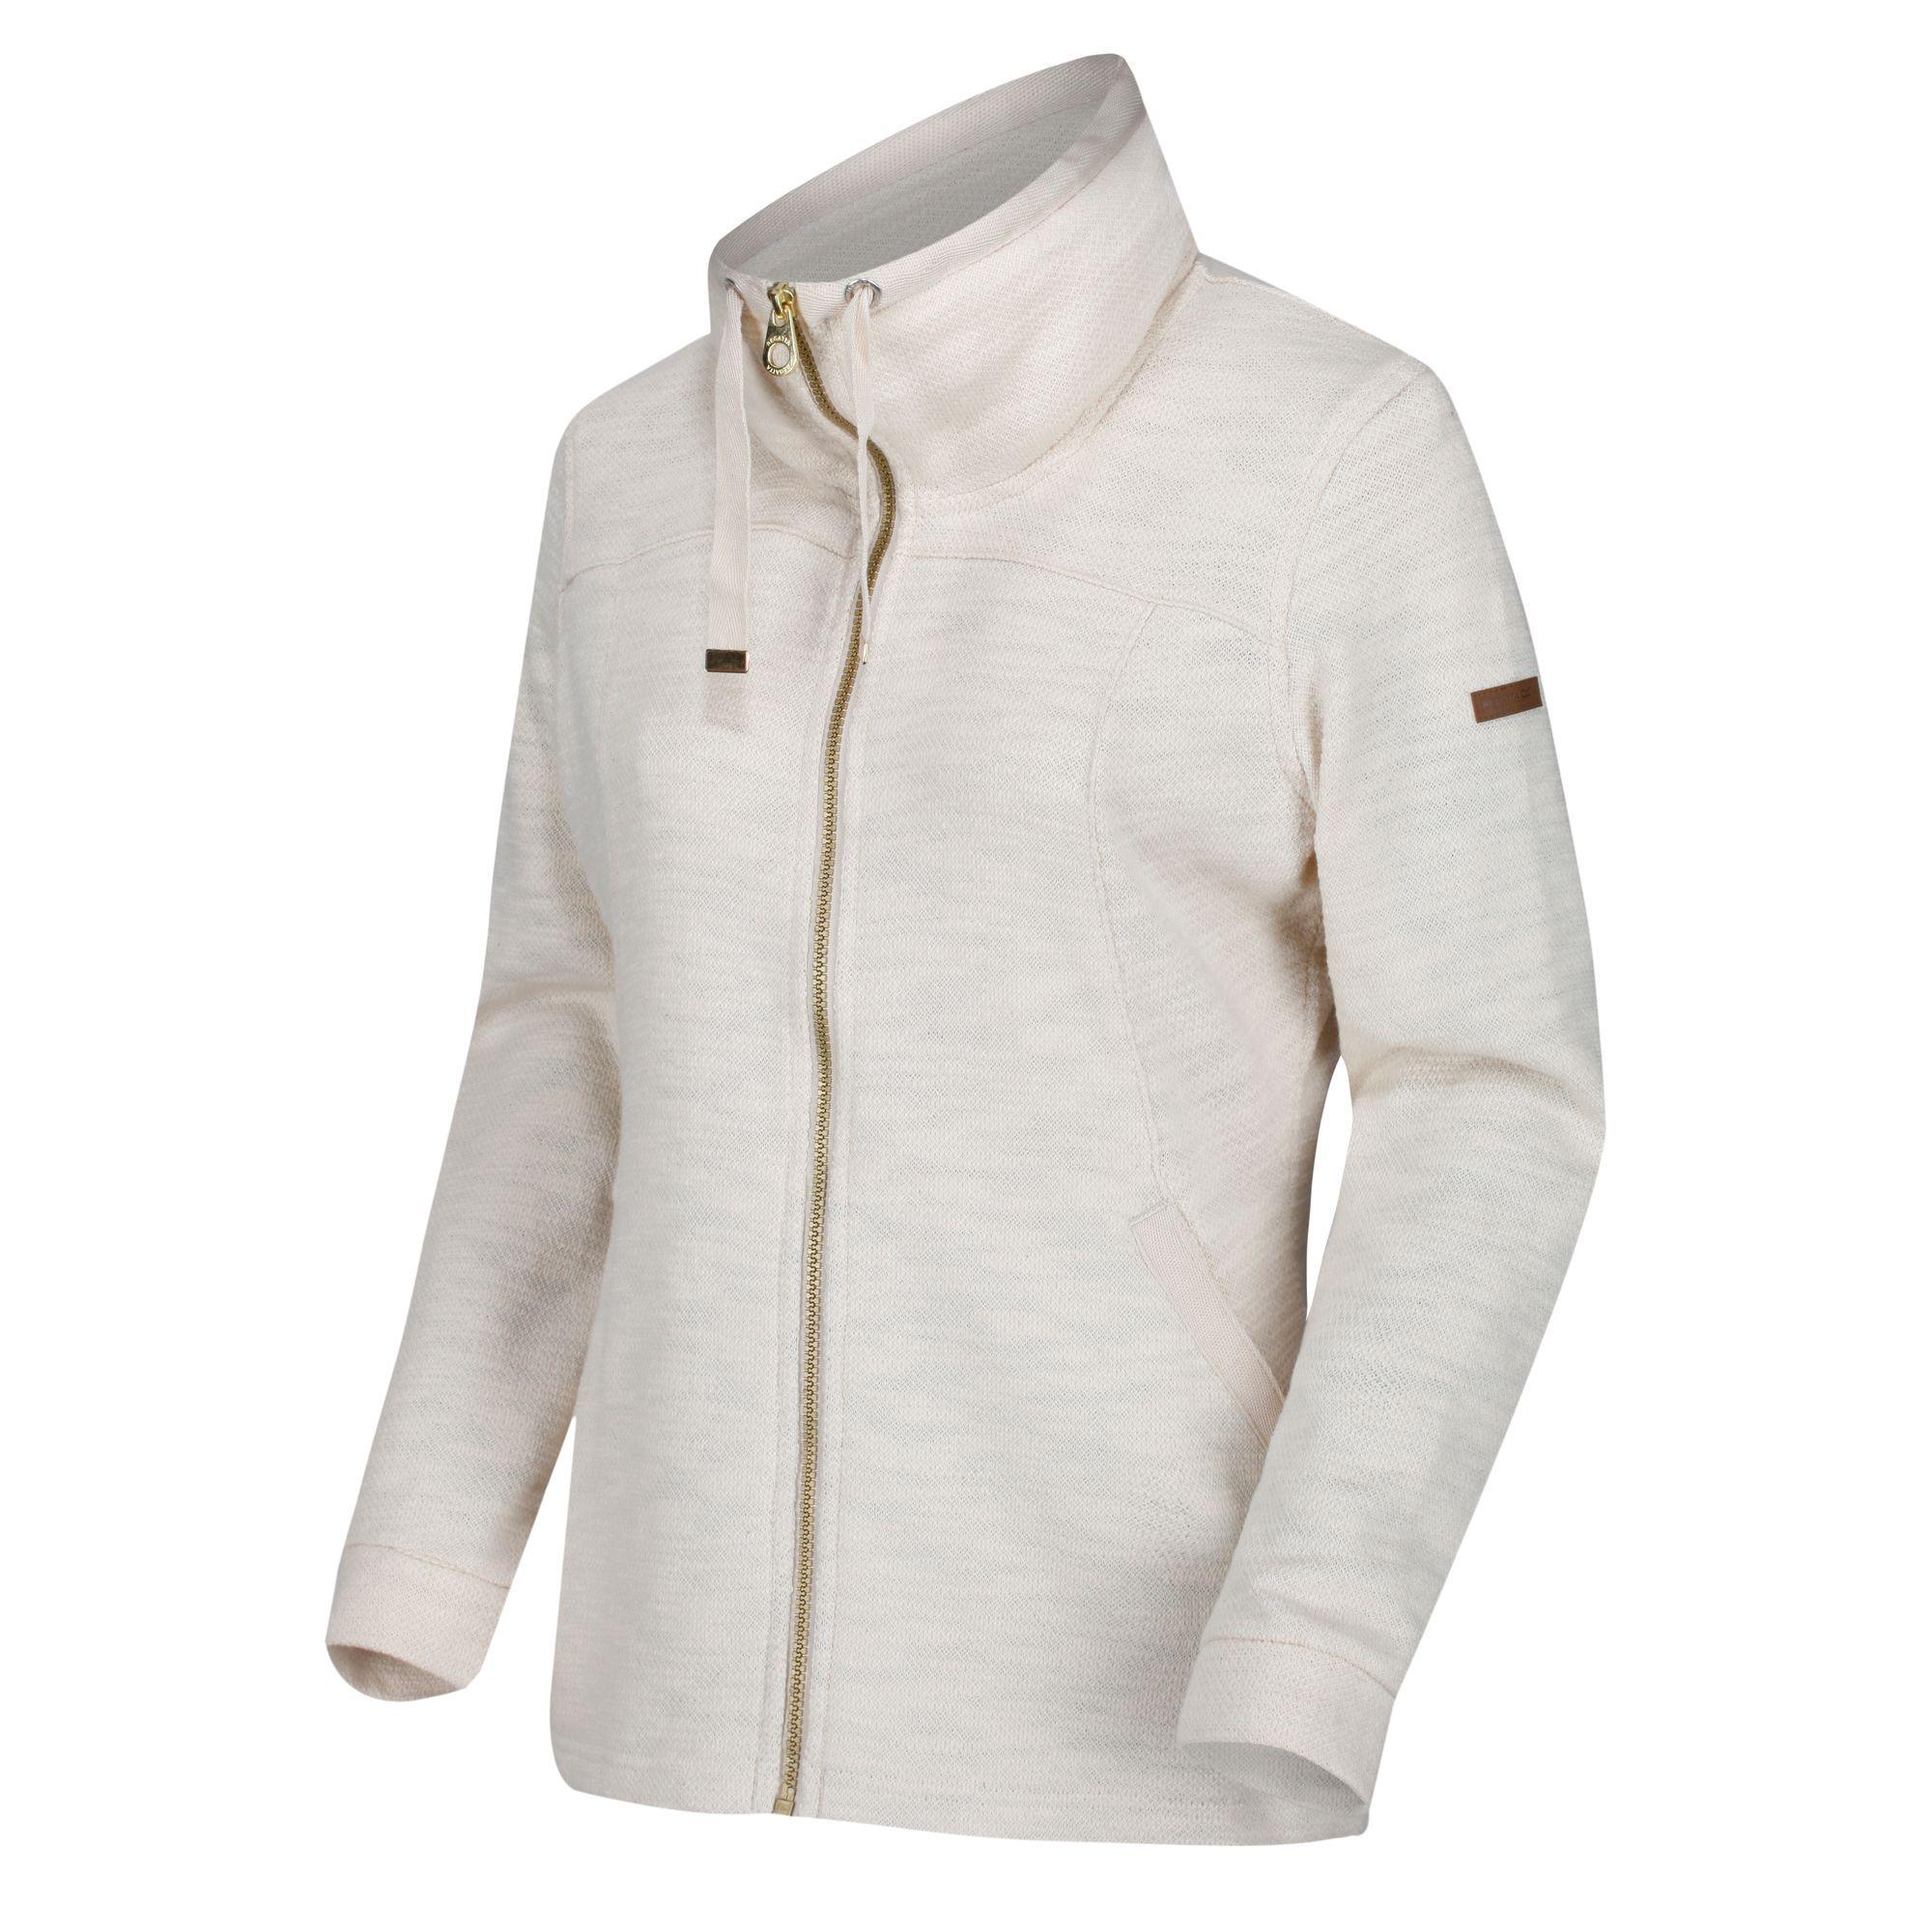 Regatta-Odetta-Womens-Warm-Curved-Full-Zip-Fleece-Jacket-RRP-50 thumbnail 24